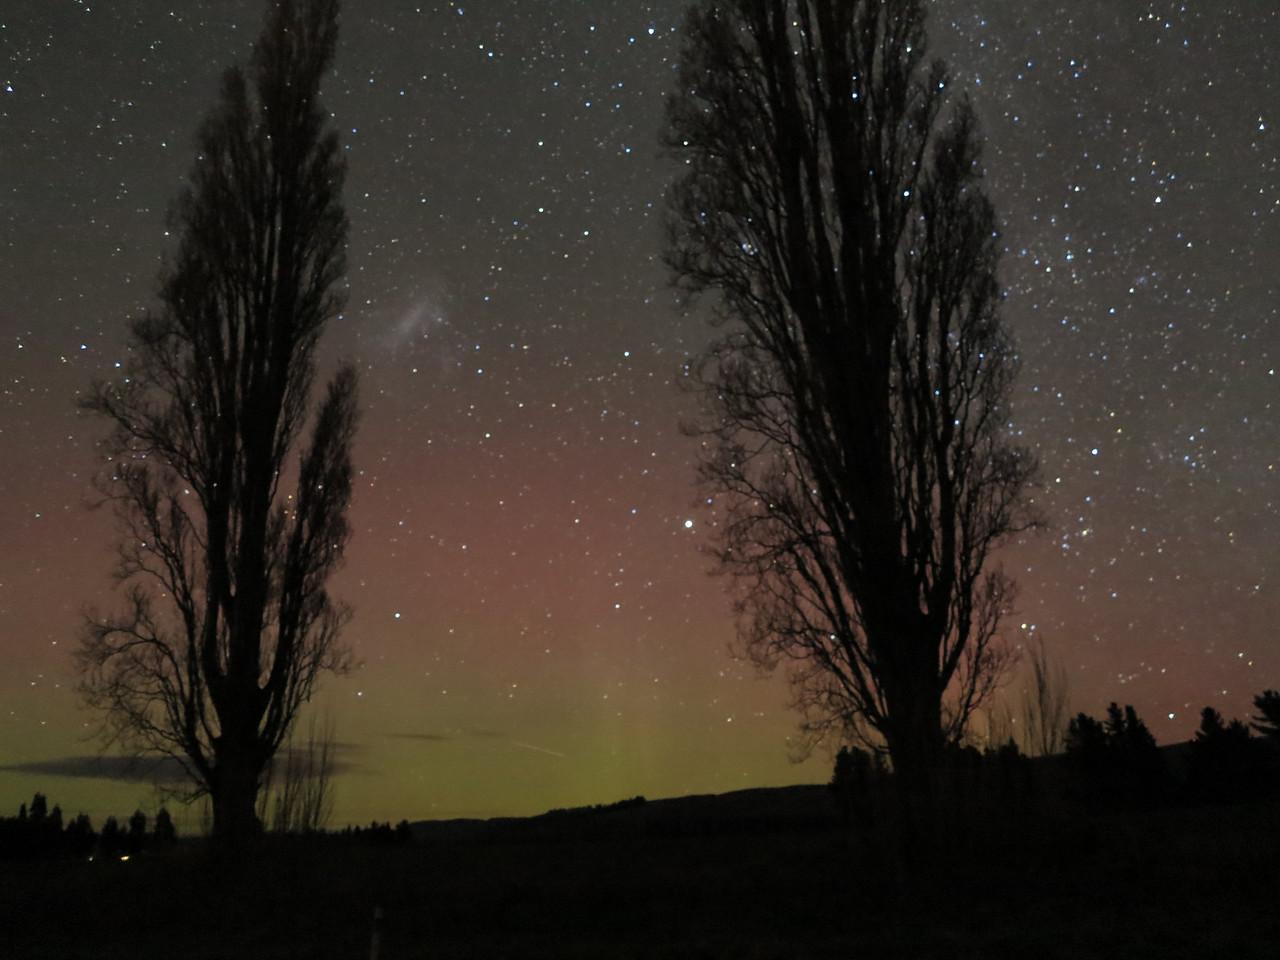 Aurora australis fading a bit